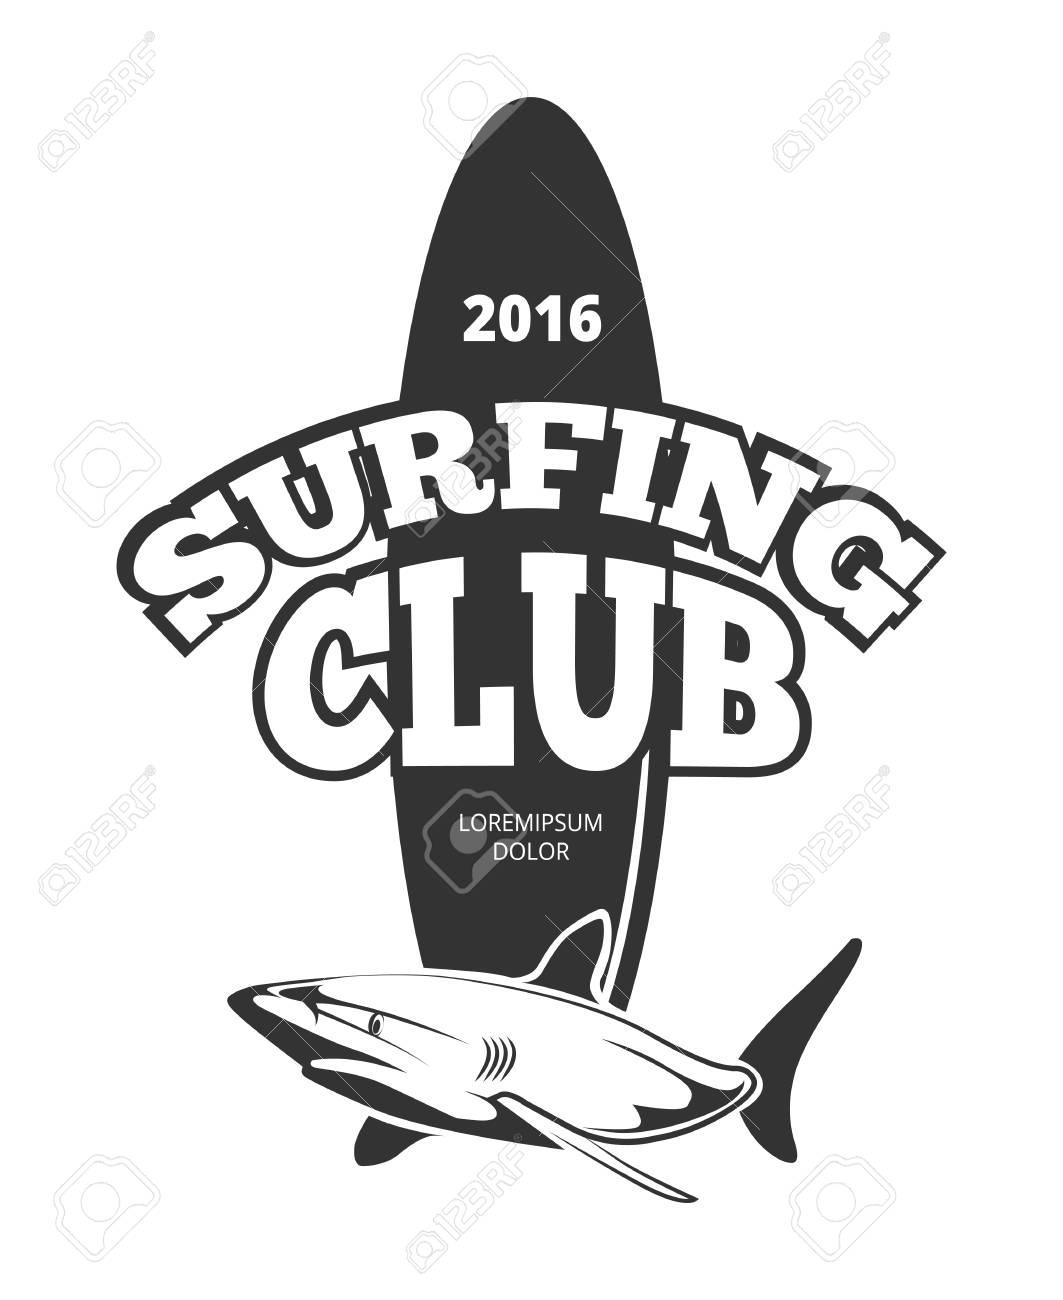 Surfing Club Logo With Board And Shark Emblem Design Vintage Surfboard Vector Illustration Stock